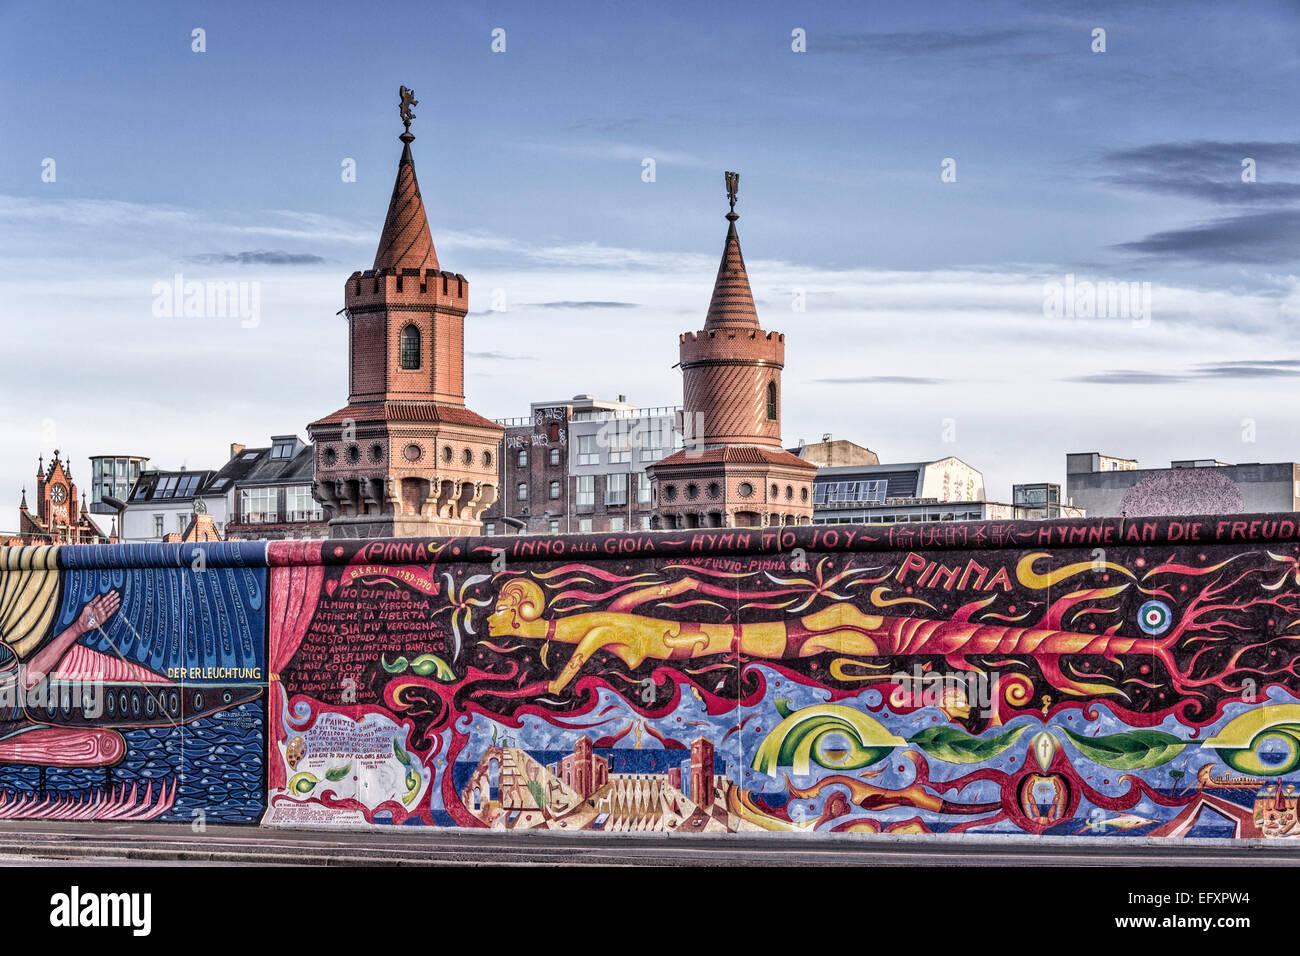 Muro de Berlín . East Side Gallery, Oberbaumbruecke, Berlín, Alemania Imagen De Stock